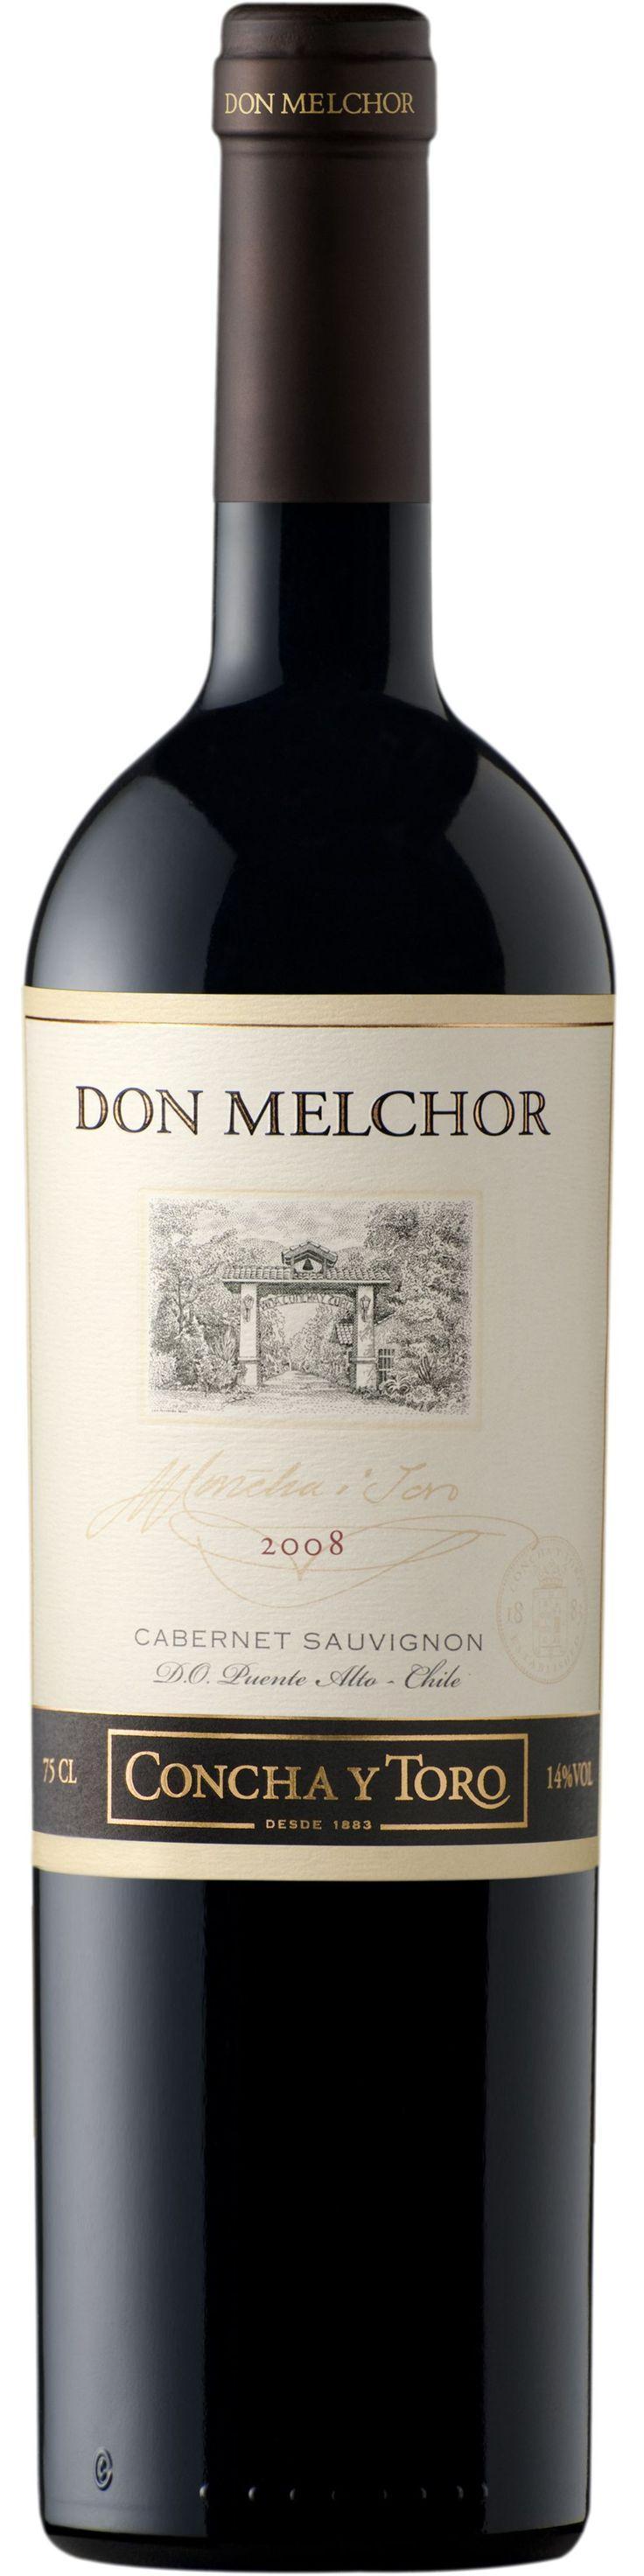 Image result for don melchor wine